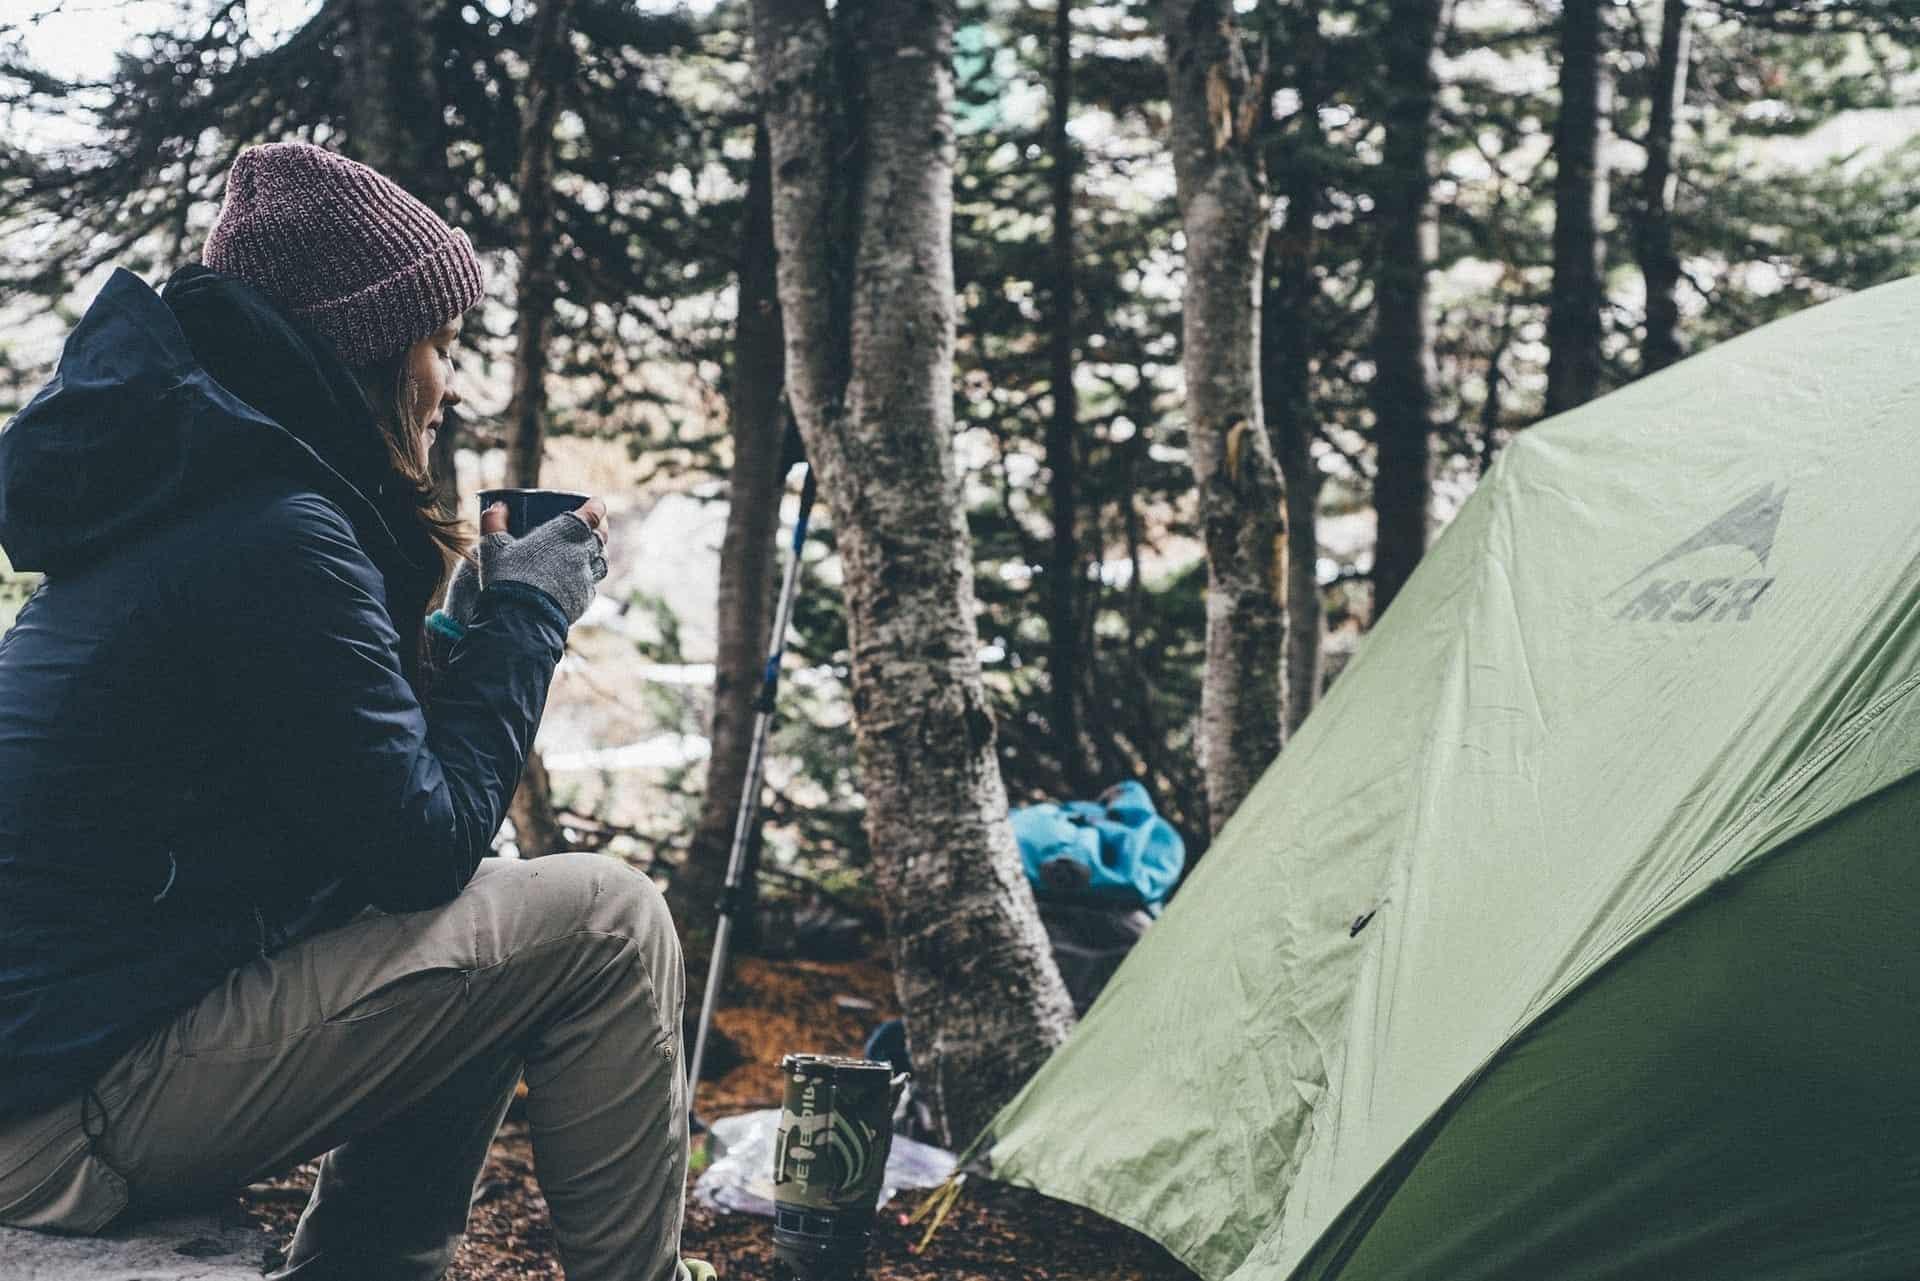 Frau mit Tasse vor dem Zelt im Wald